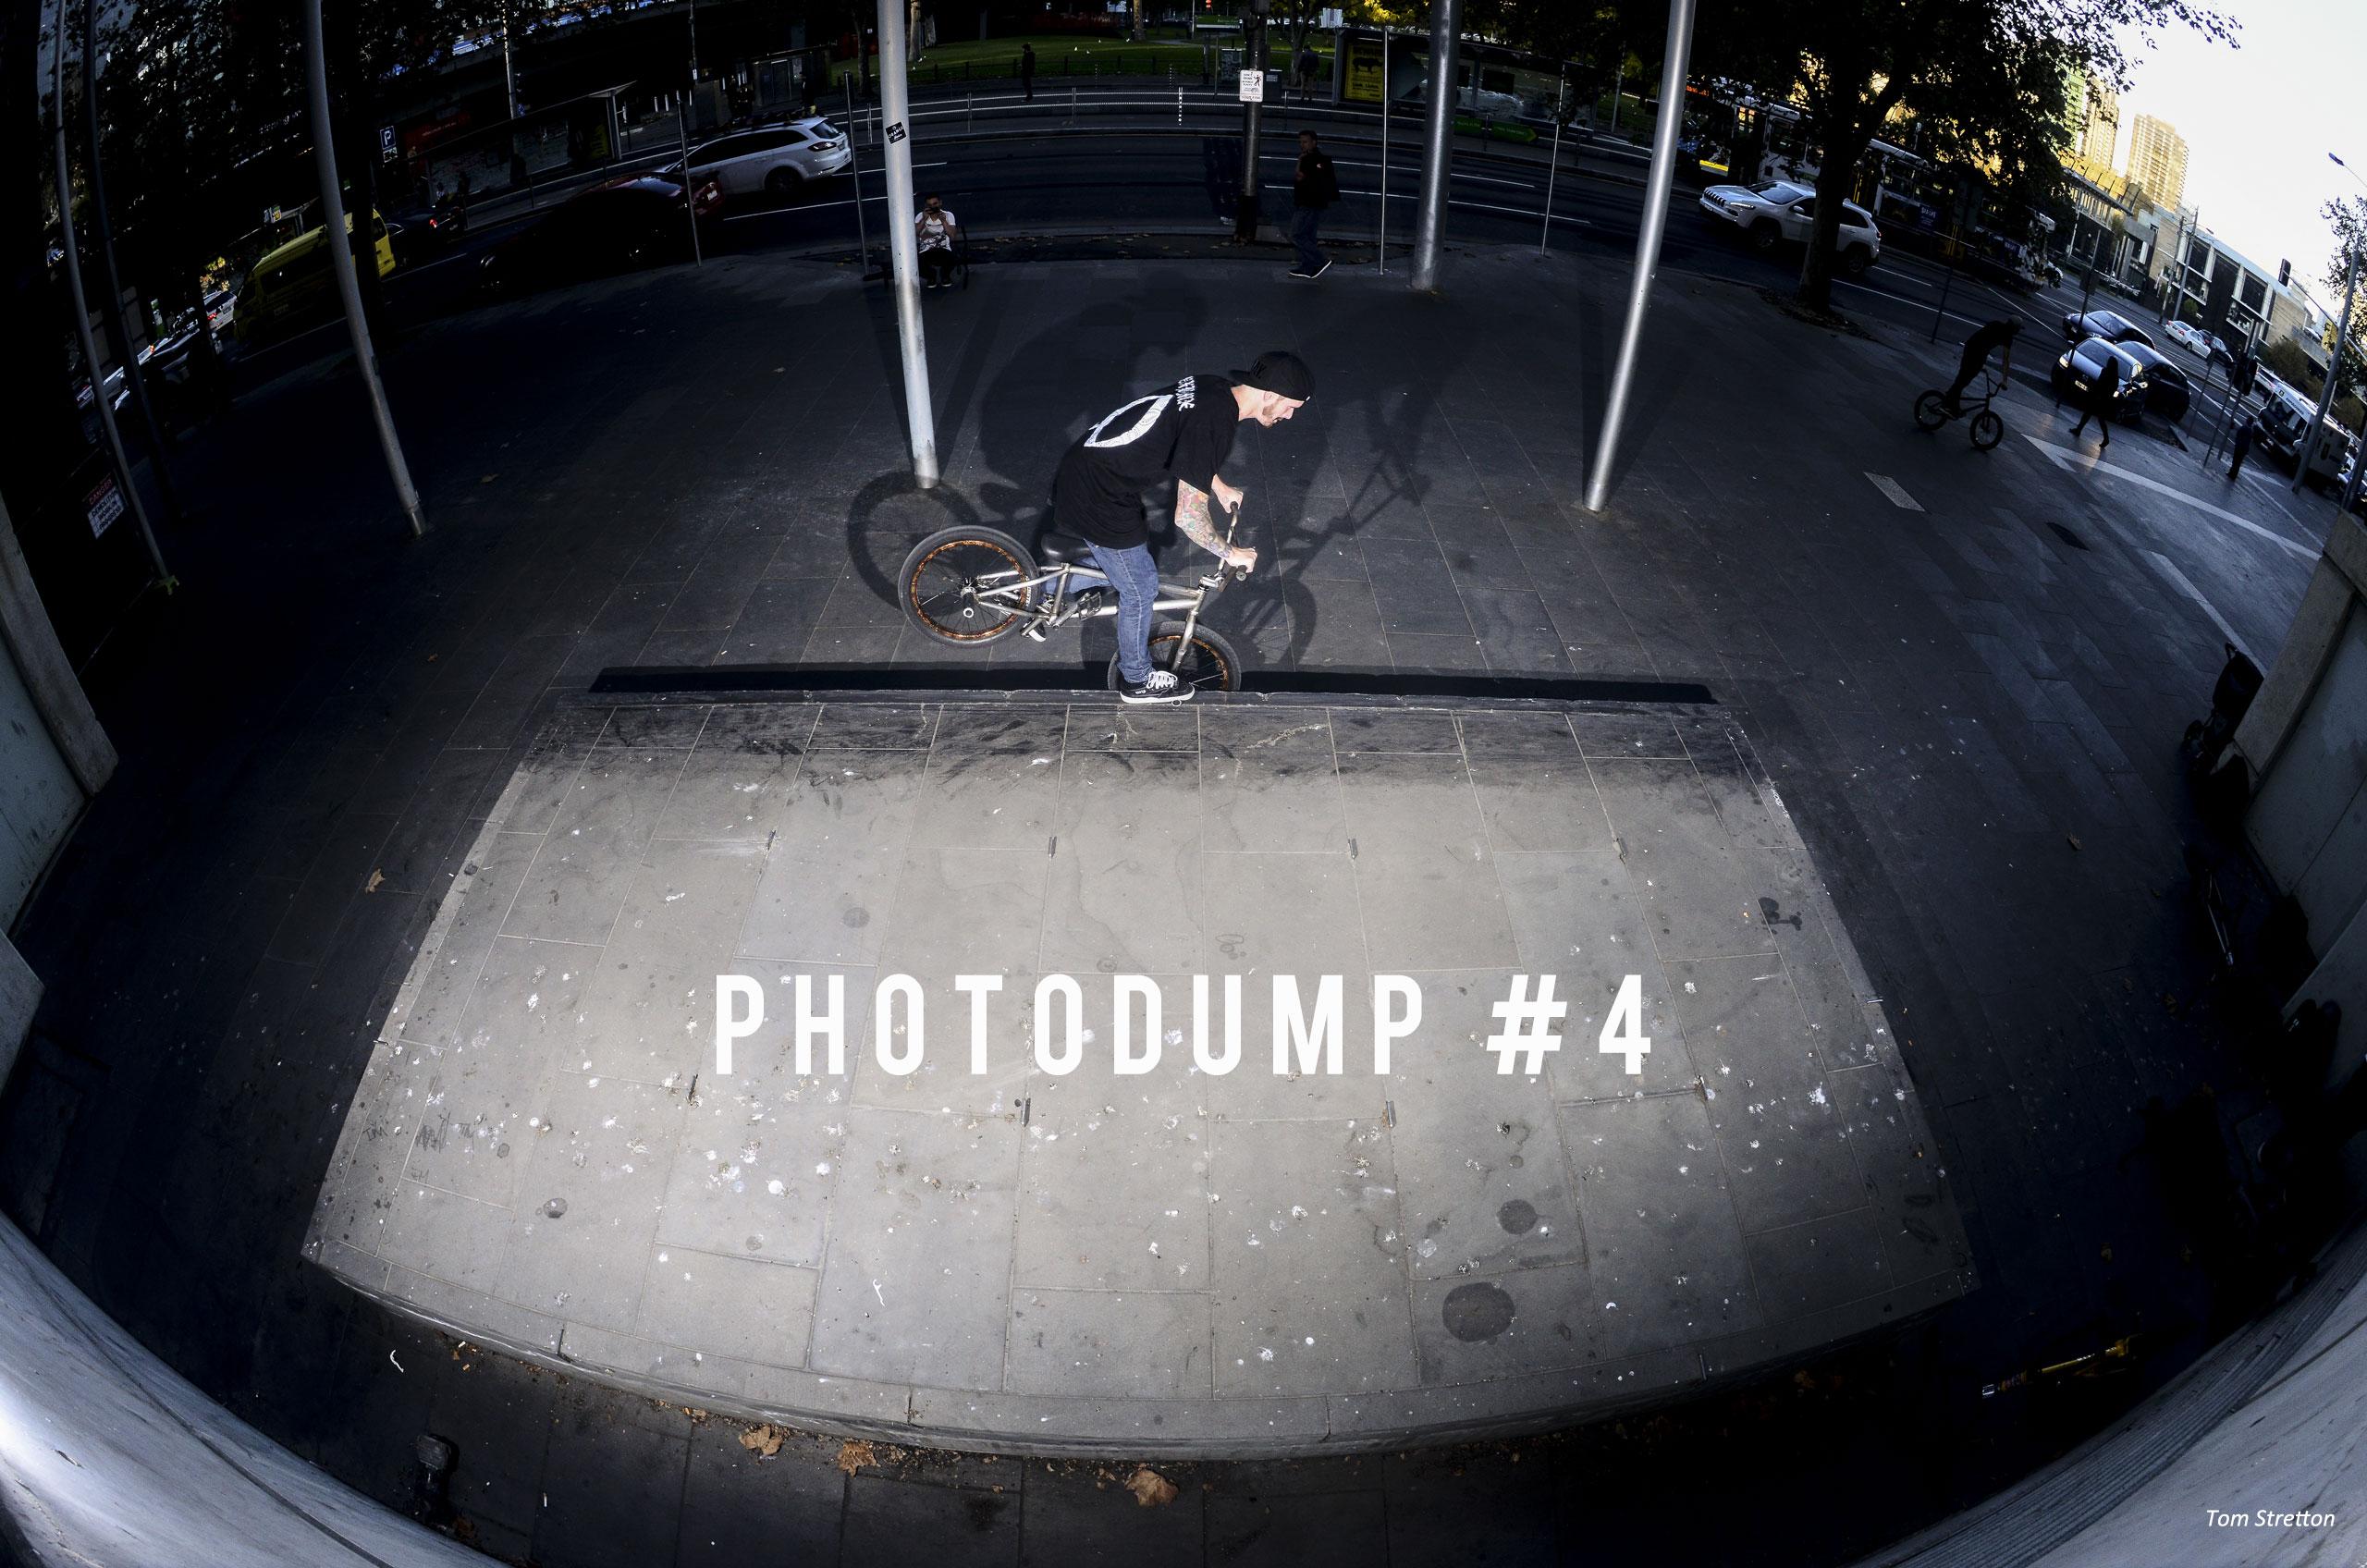 PHOTODUMP 4